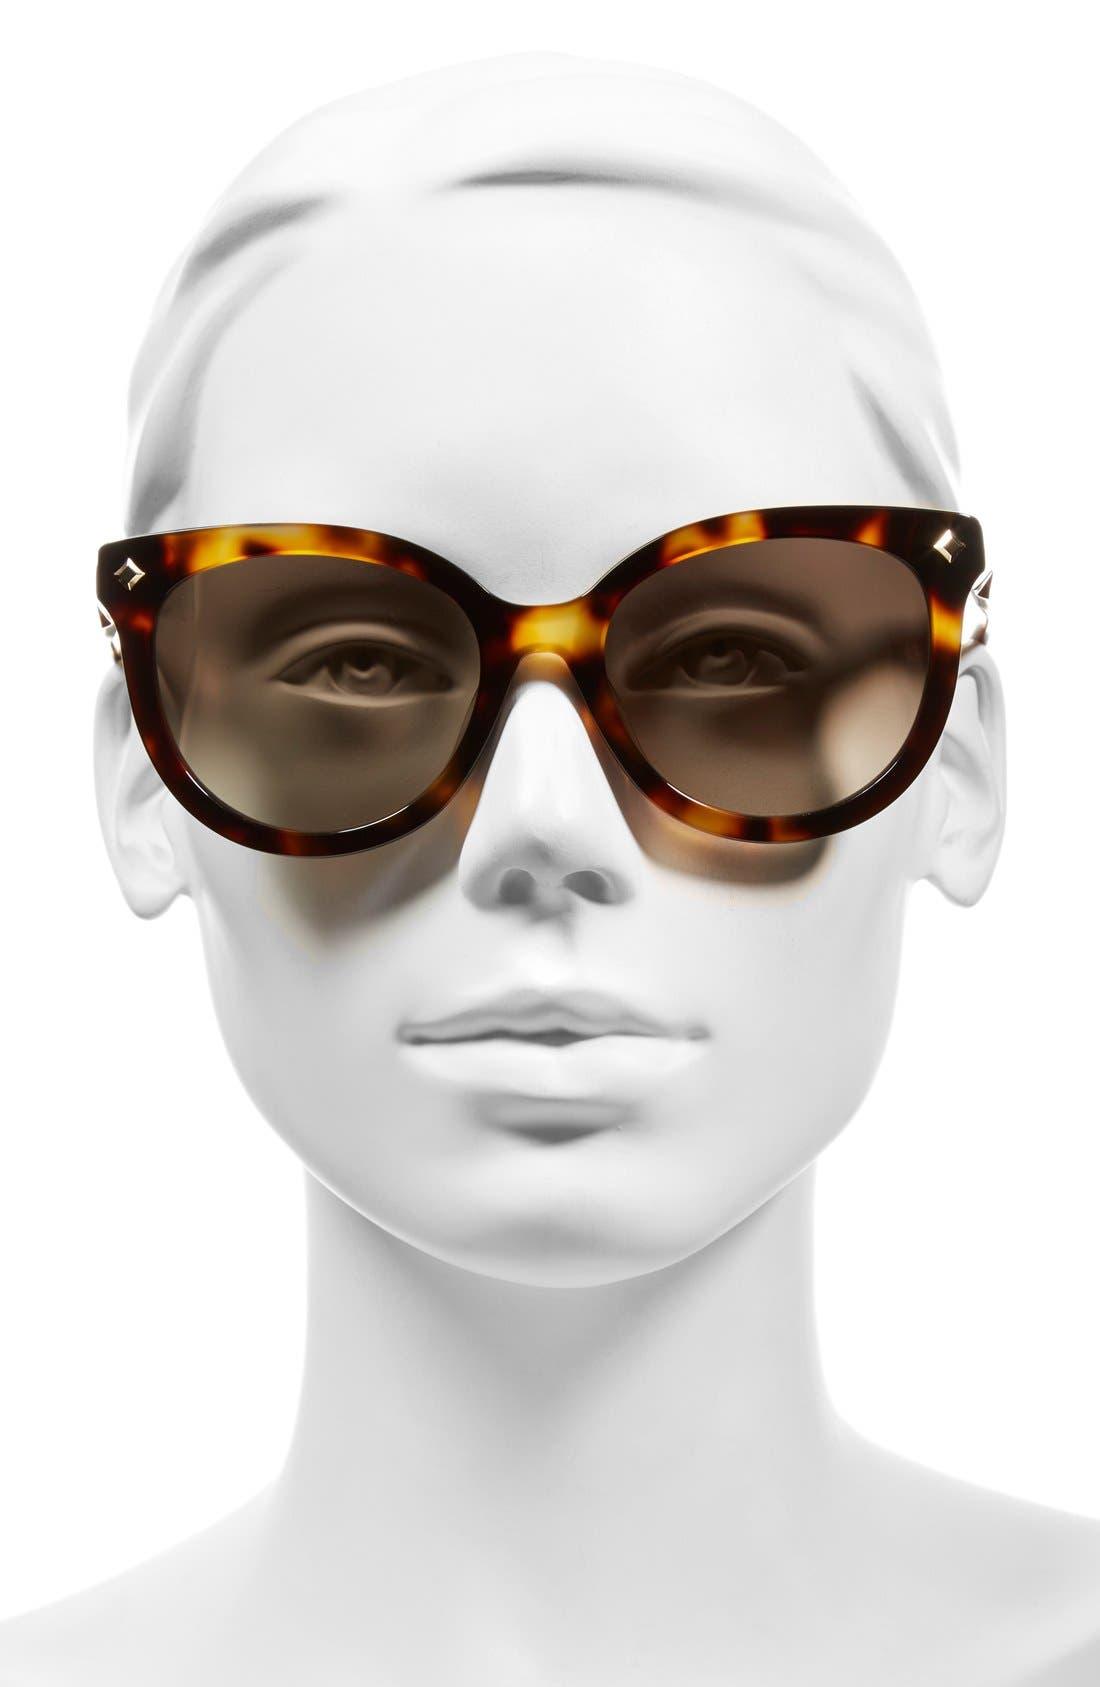 56mm Retro Sunglasses,                             Alternate thumbnail 2, color,                             Havana